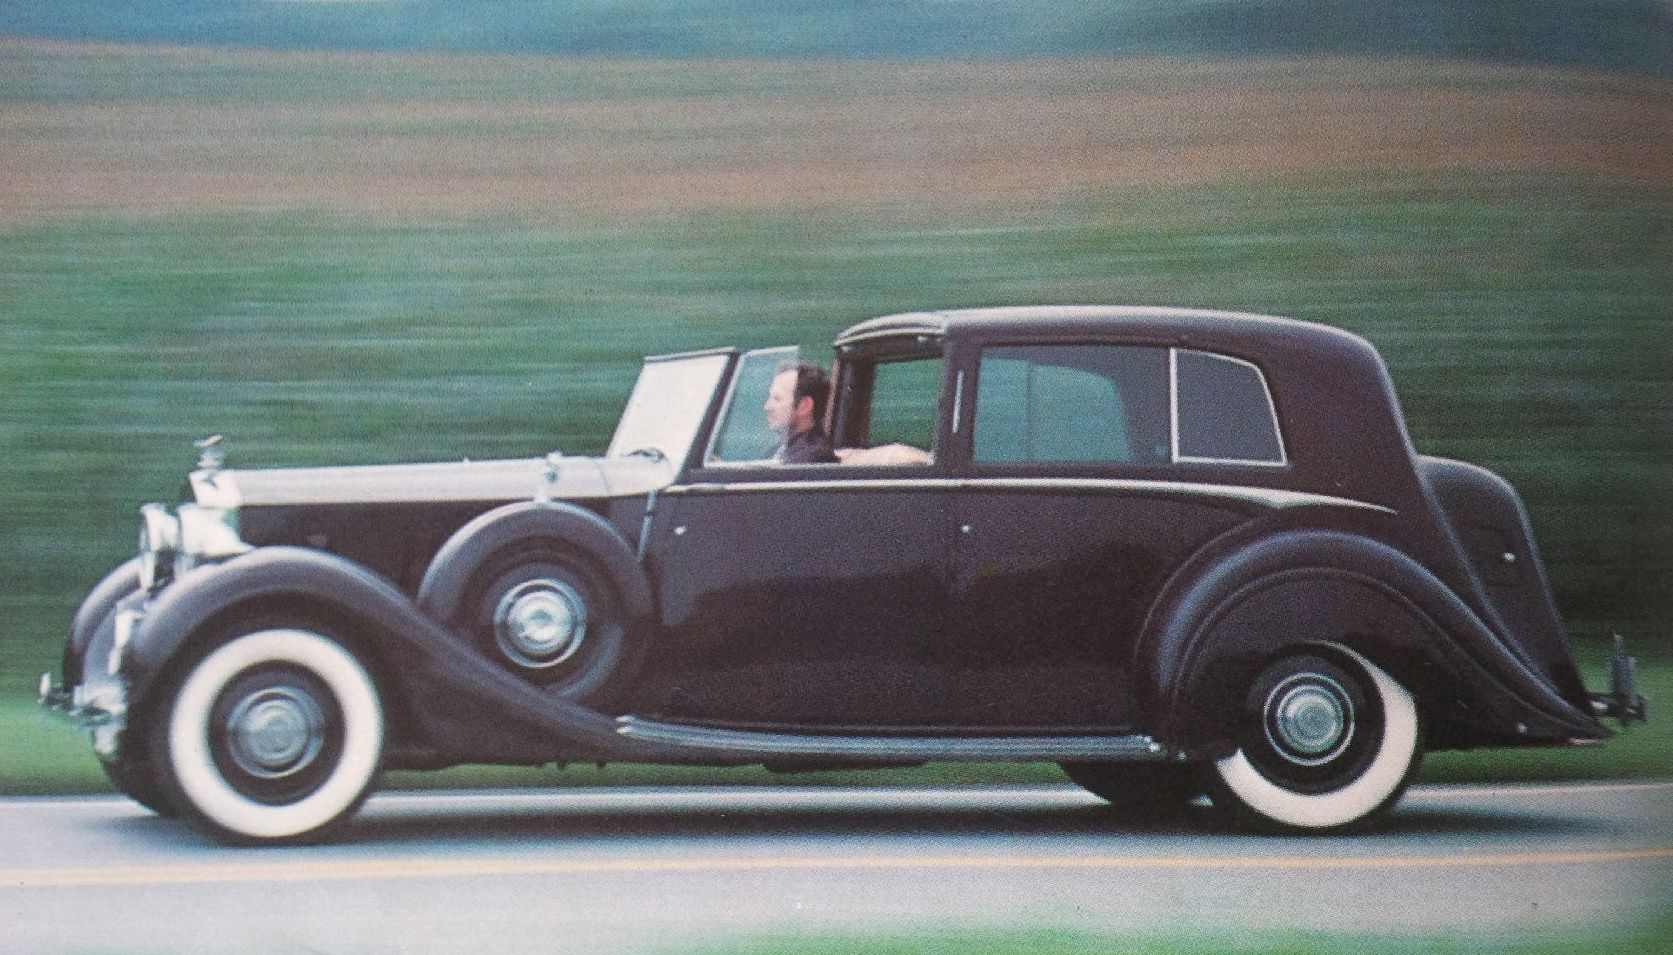 1939 Sedanca de Ville by H.J. Mulliner